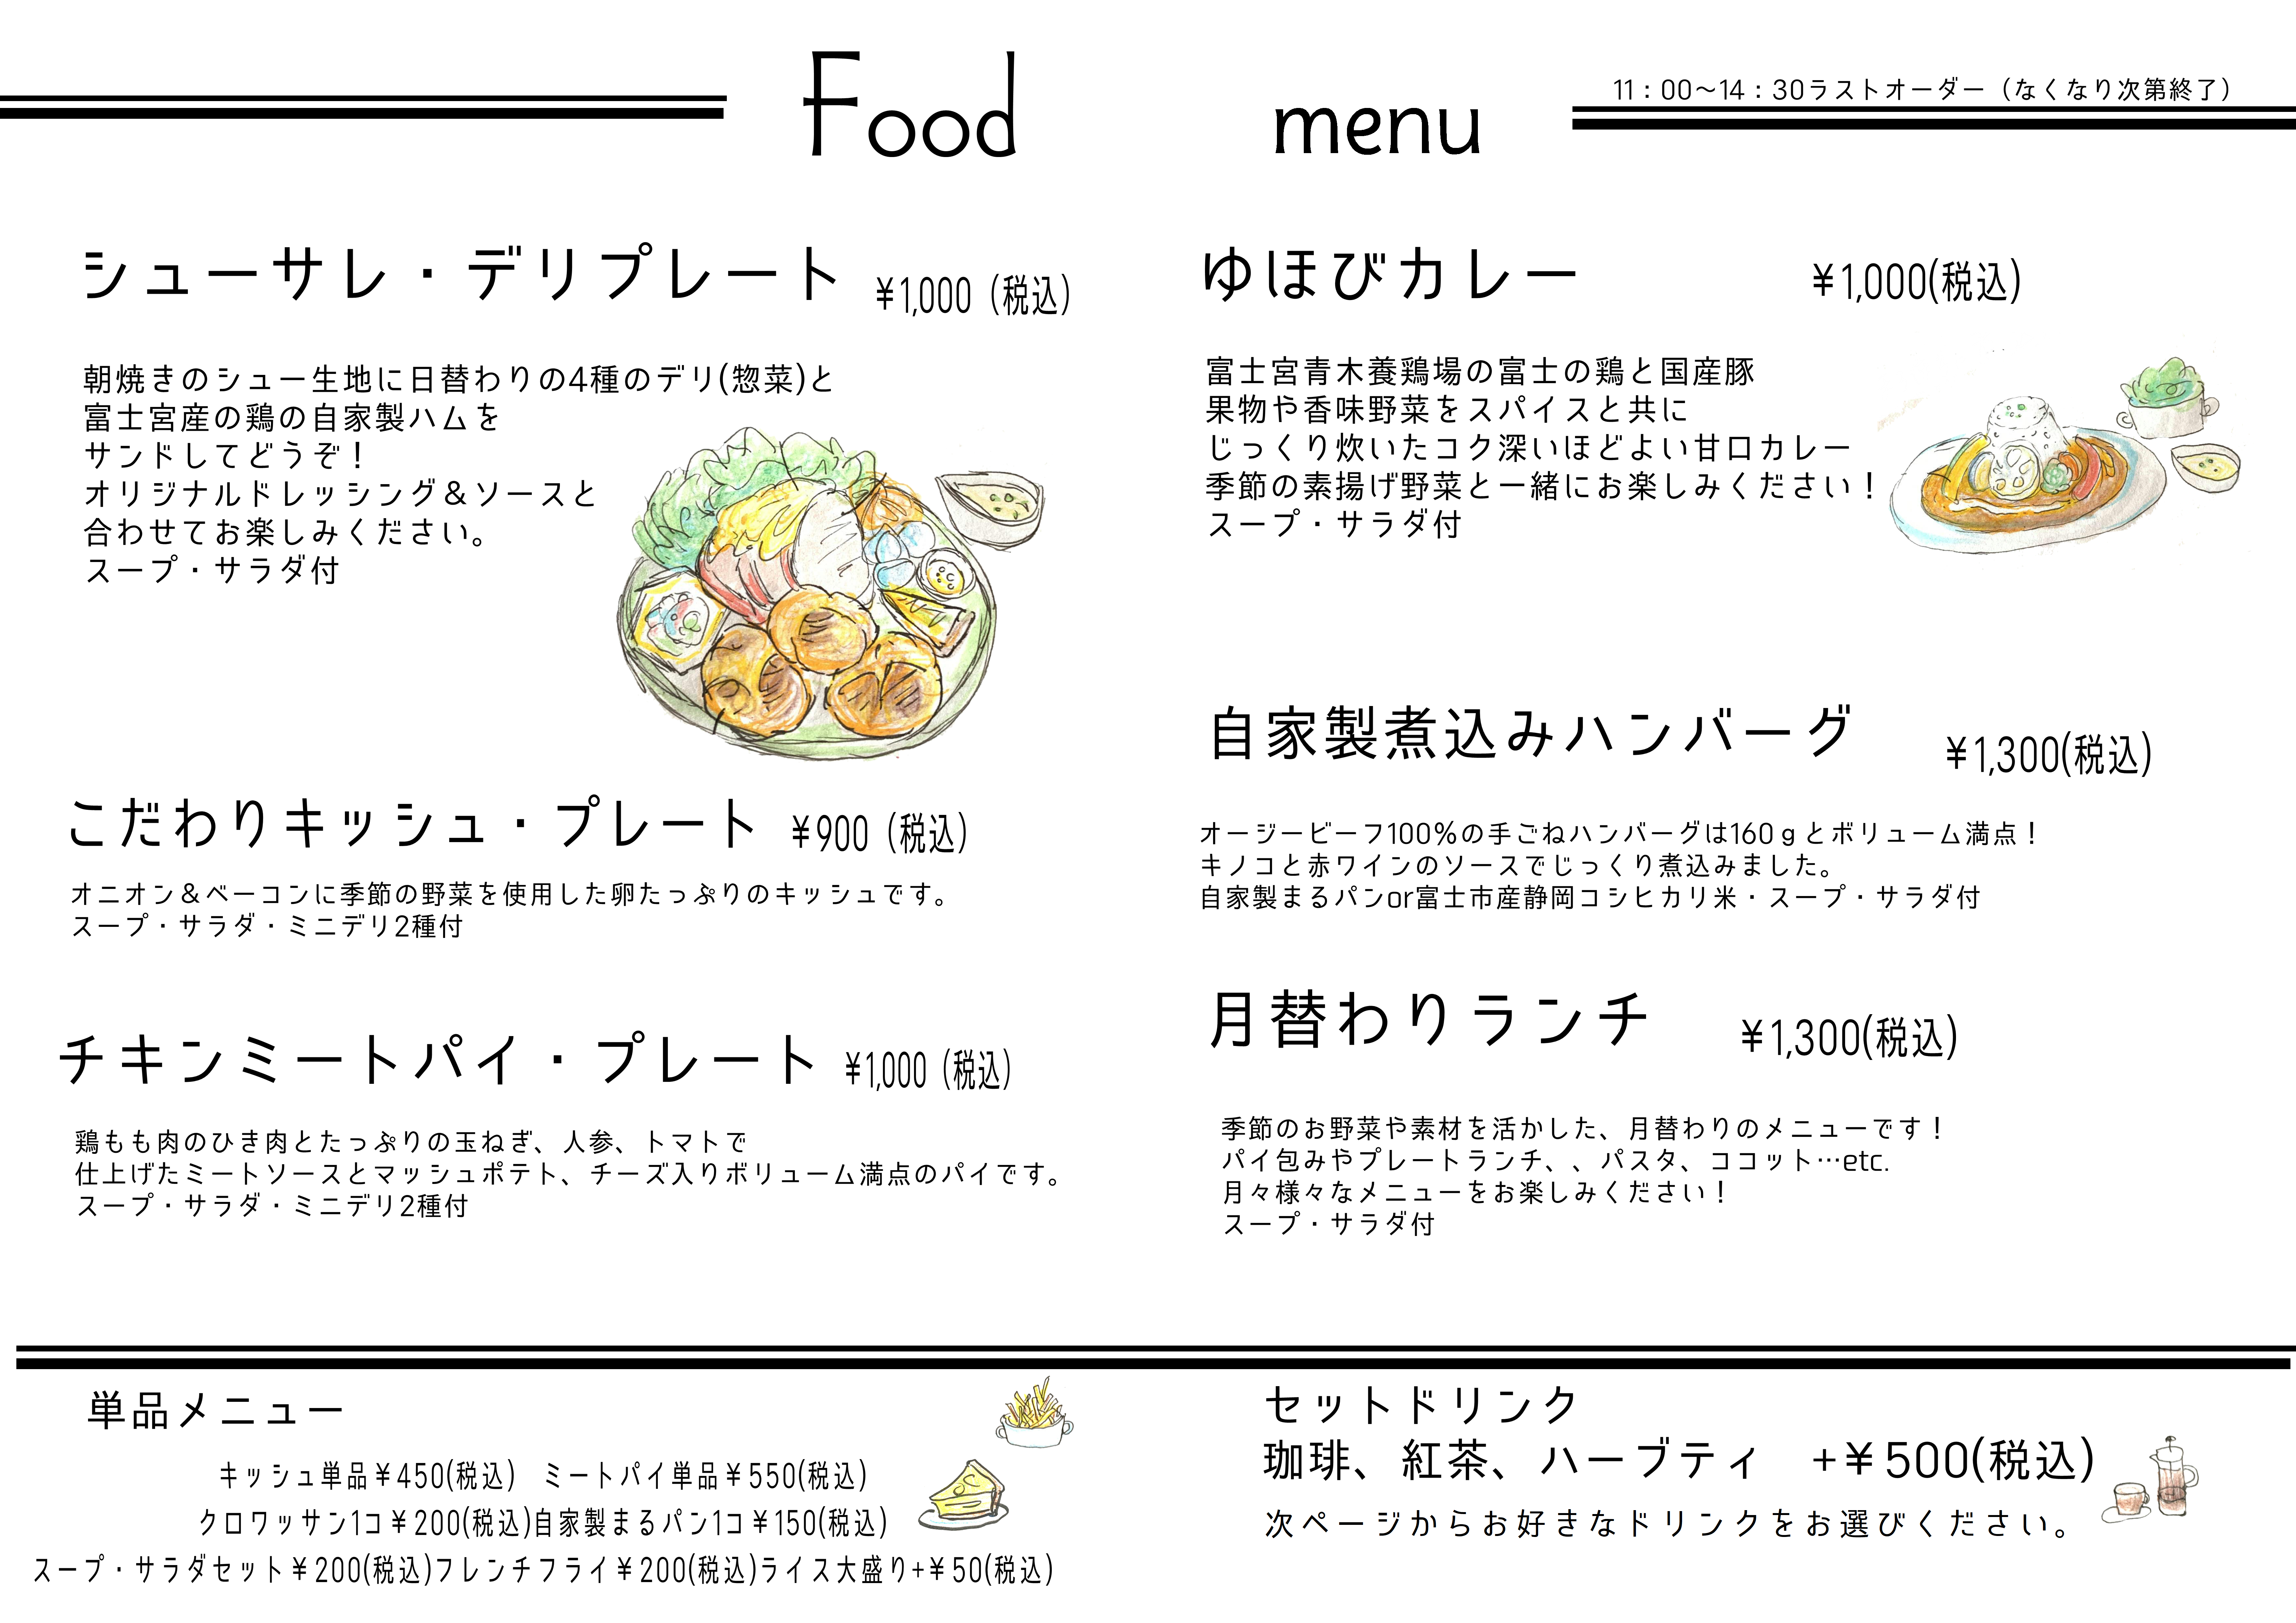 Lunch menu 11:00~14:30